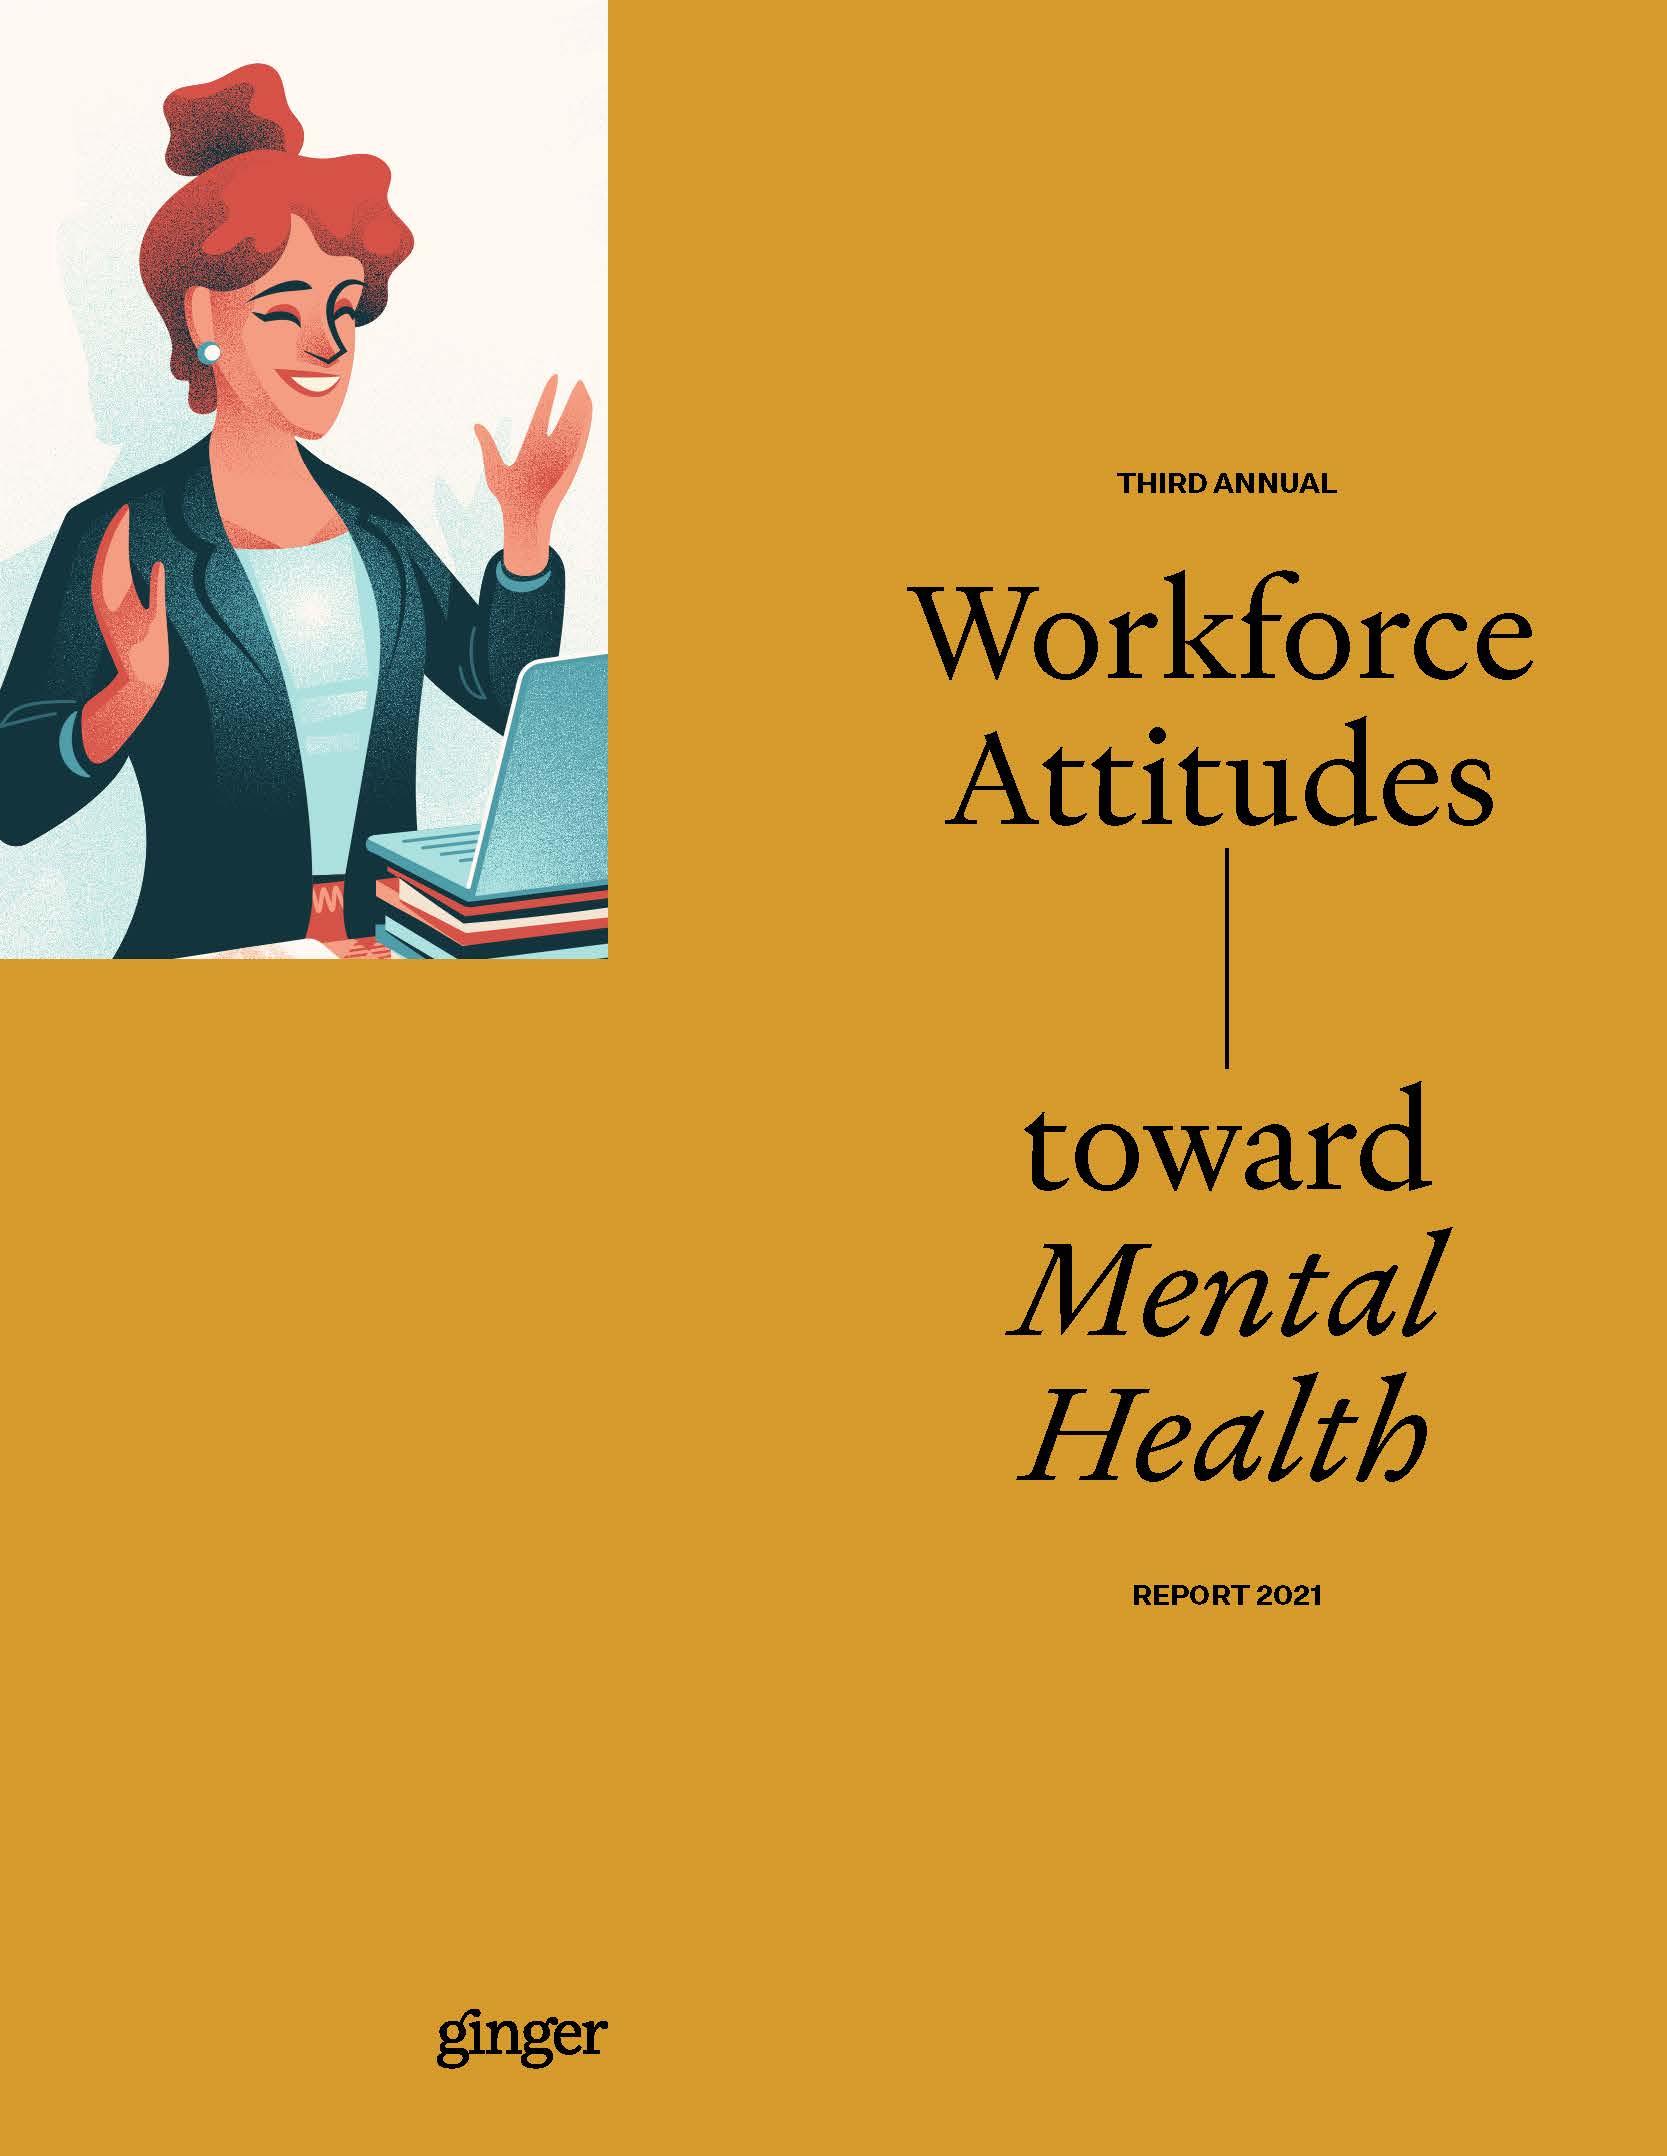 2021 Workforce Attitudes Toward Mental Health